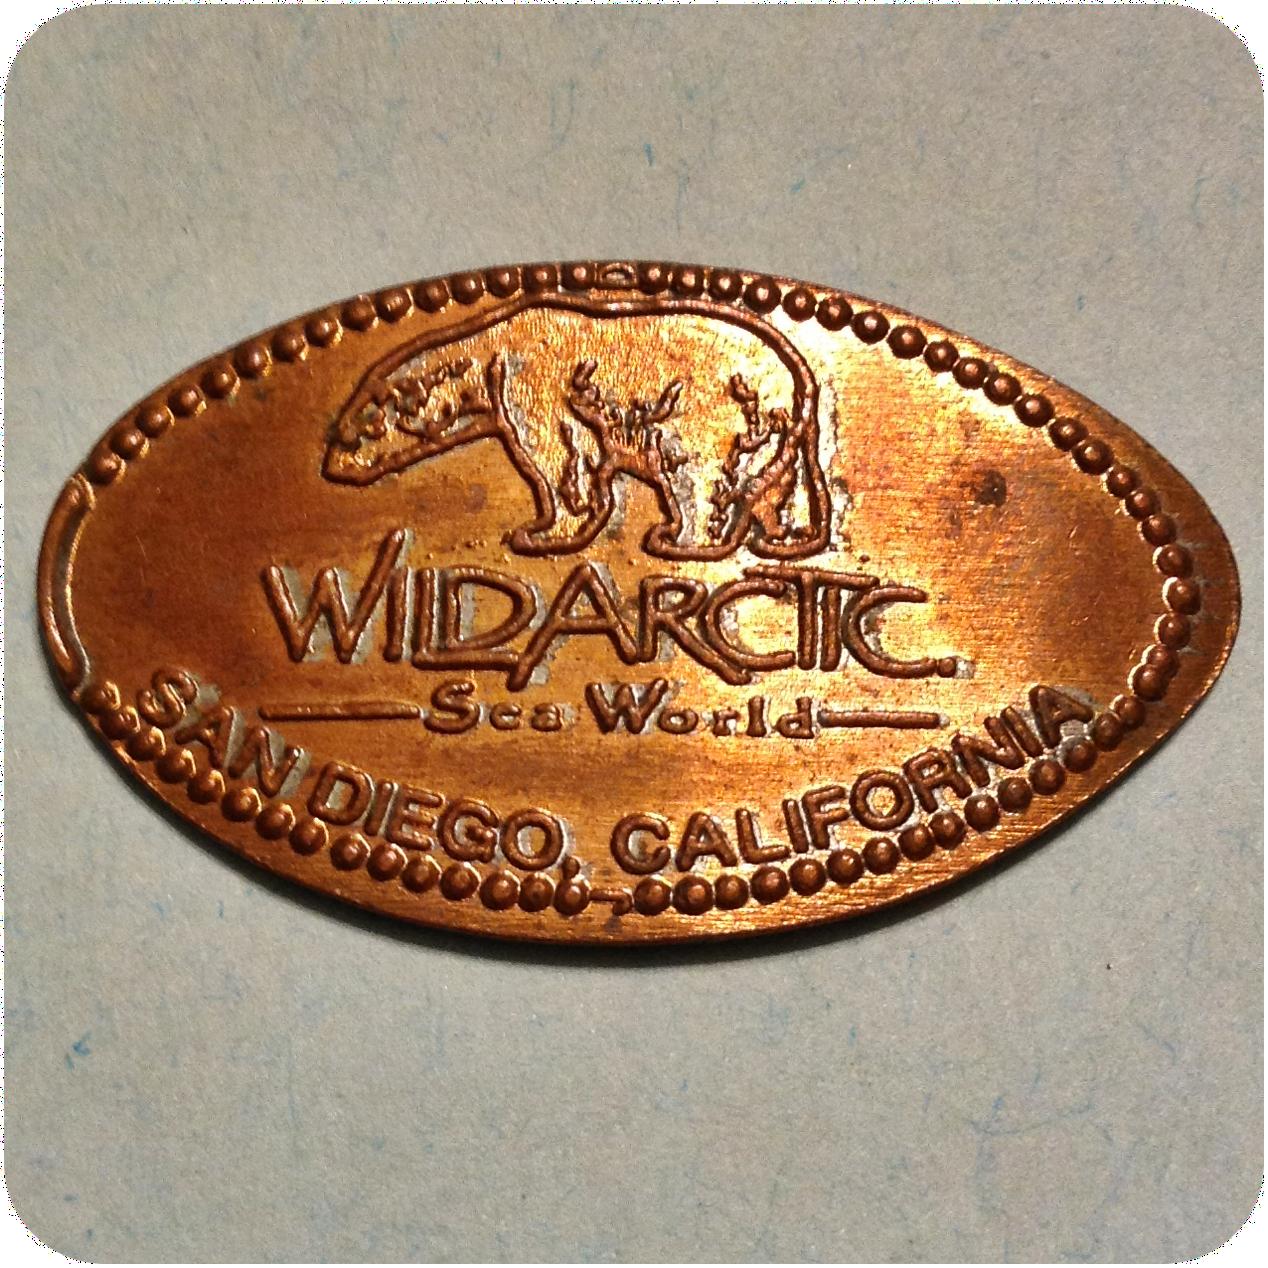 Retired Wildarctic Sea World, SeaSide Living Store, San Diego CA California Coin